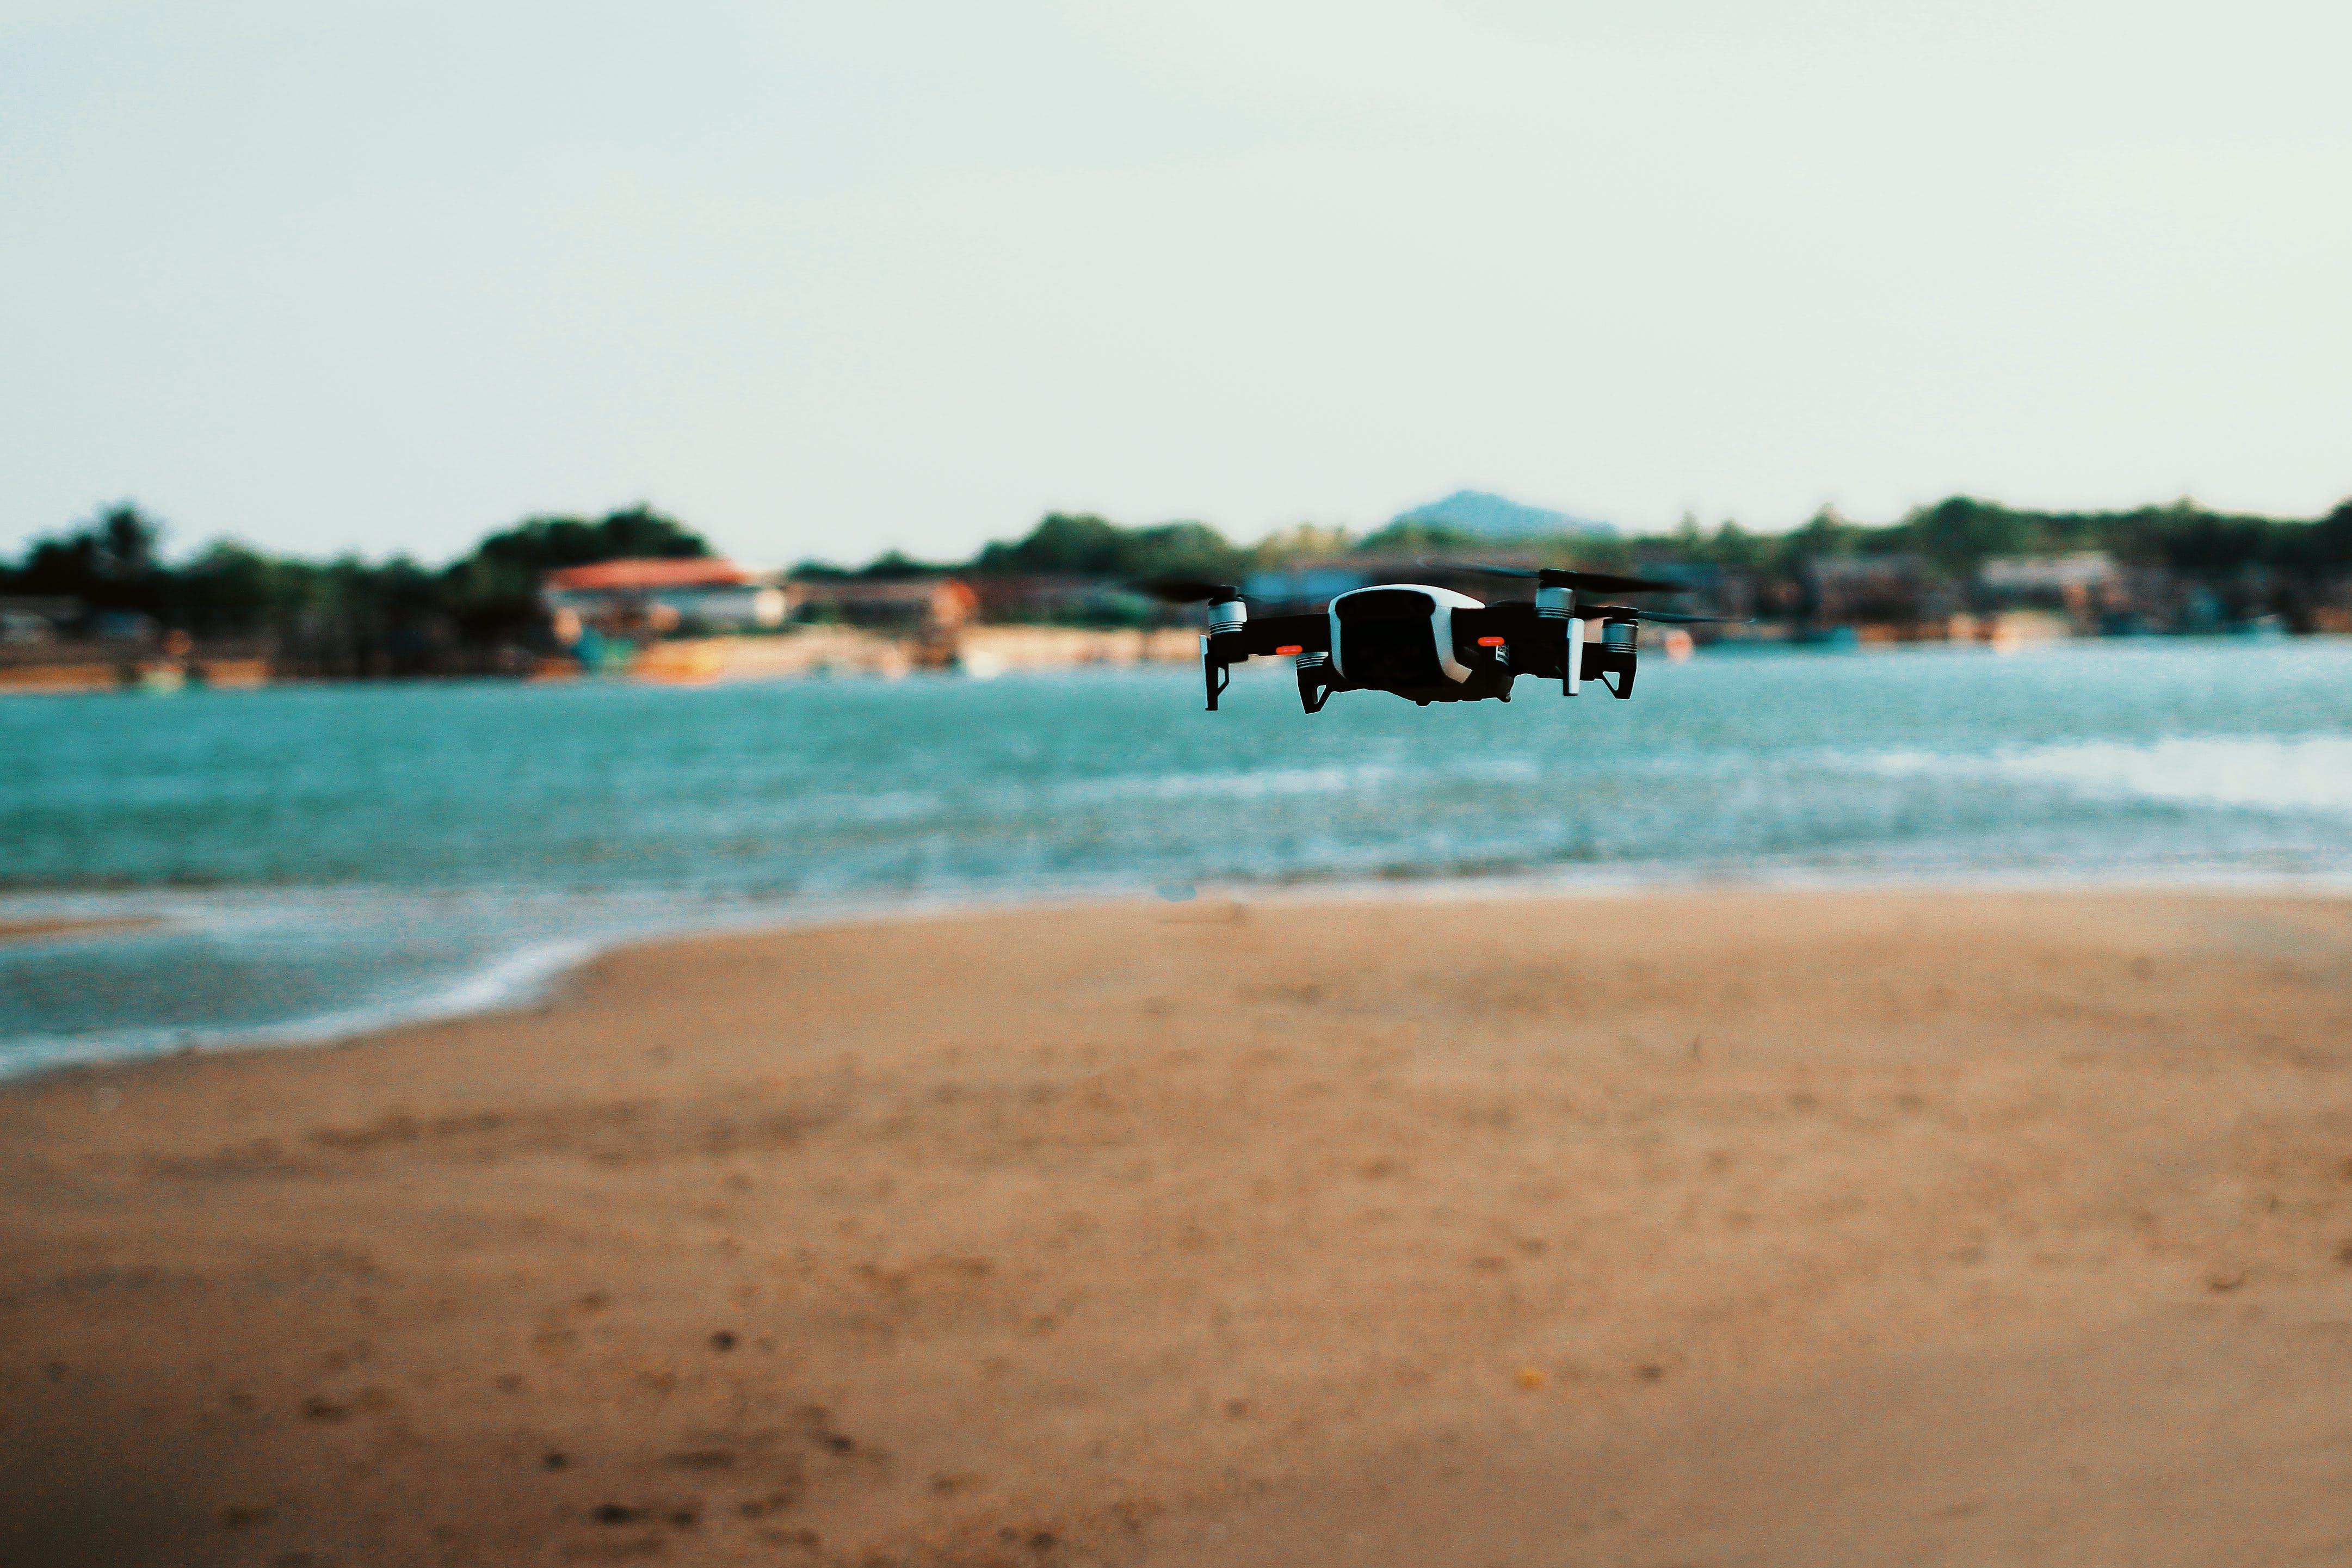 Black Quadcopter Drone On Flight